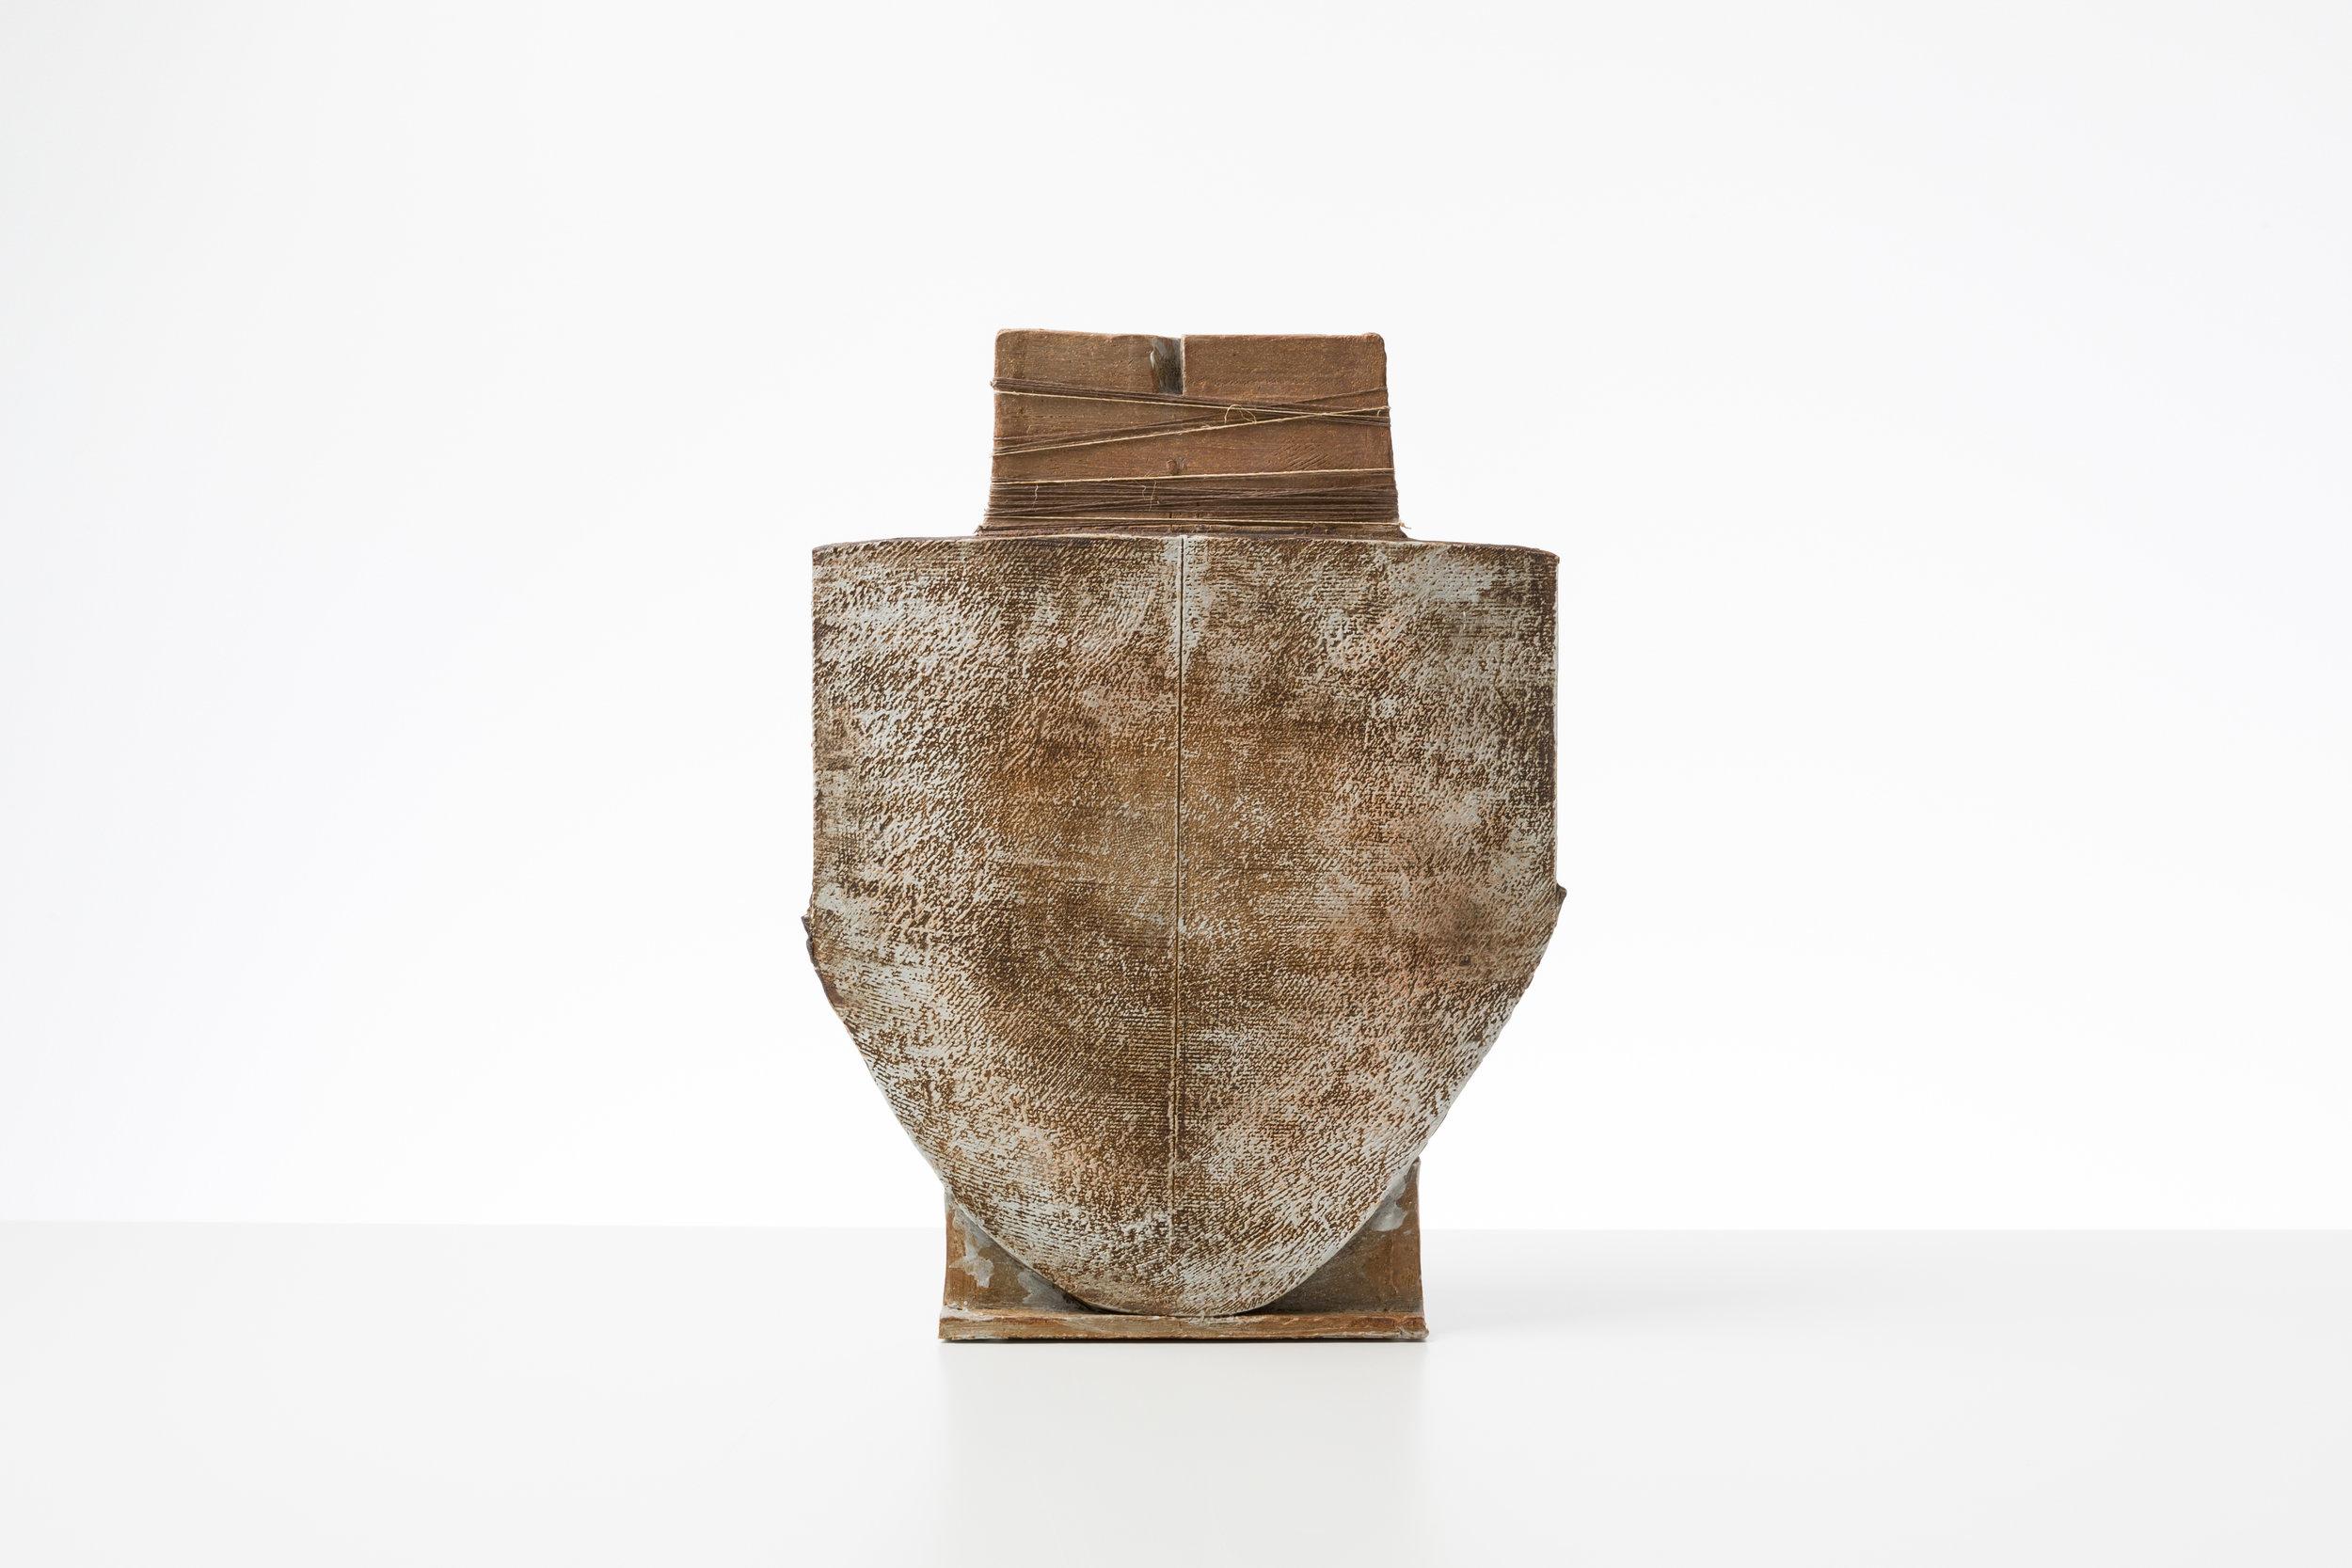 Toni Ross  Stele #19 , 2016 stoneware, slip and hemp thread 17 3/4 x 13 1/2 x 5 in.